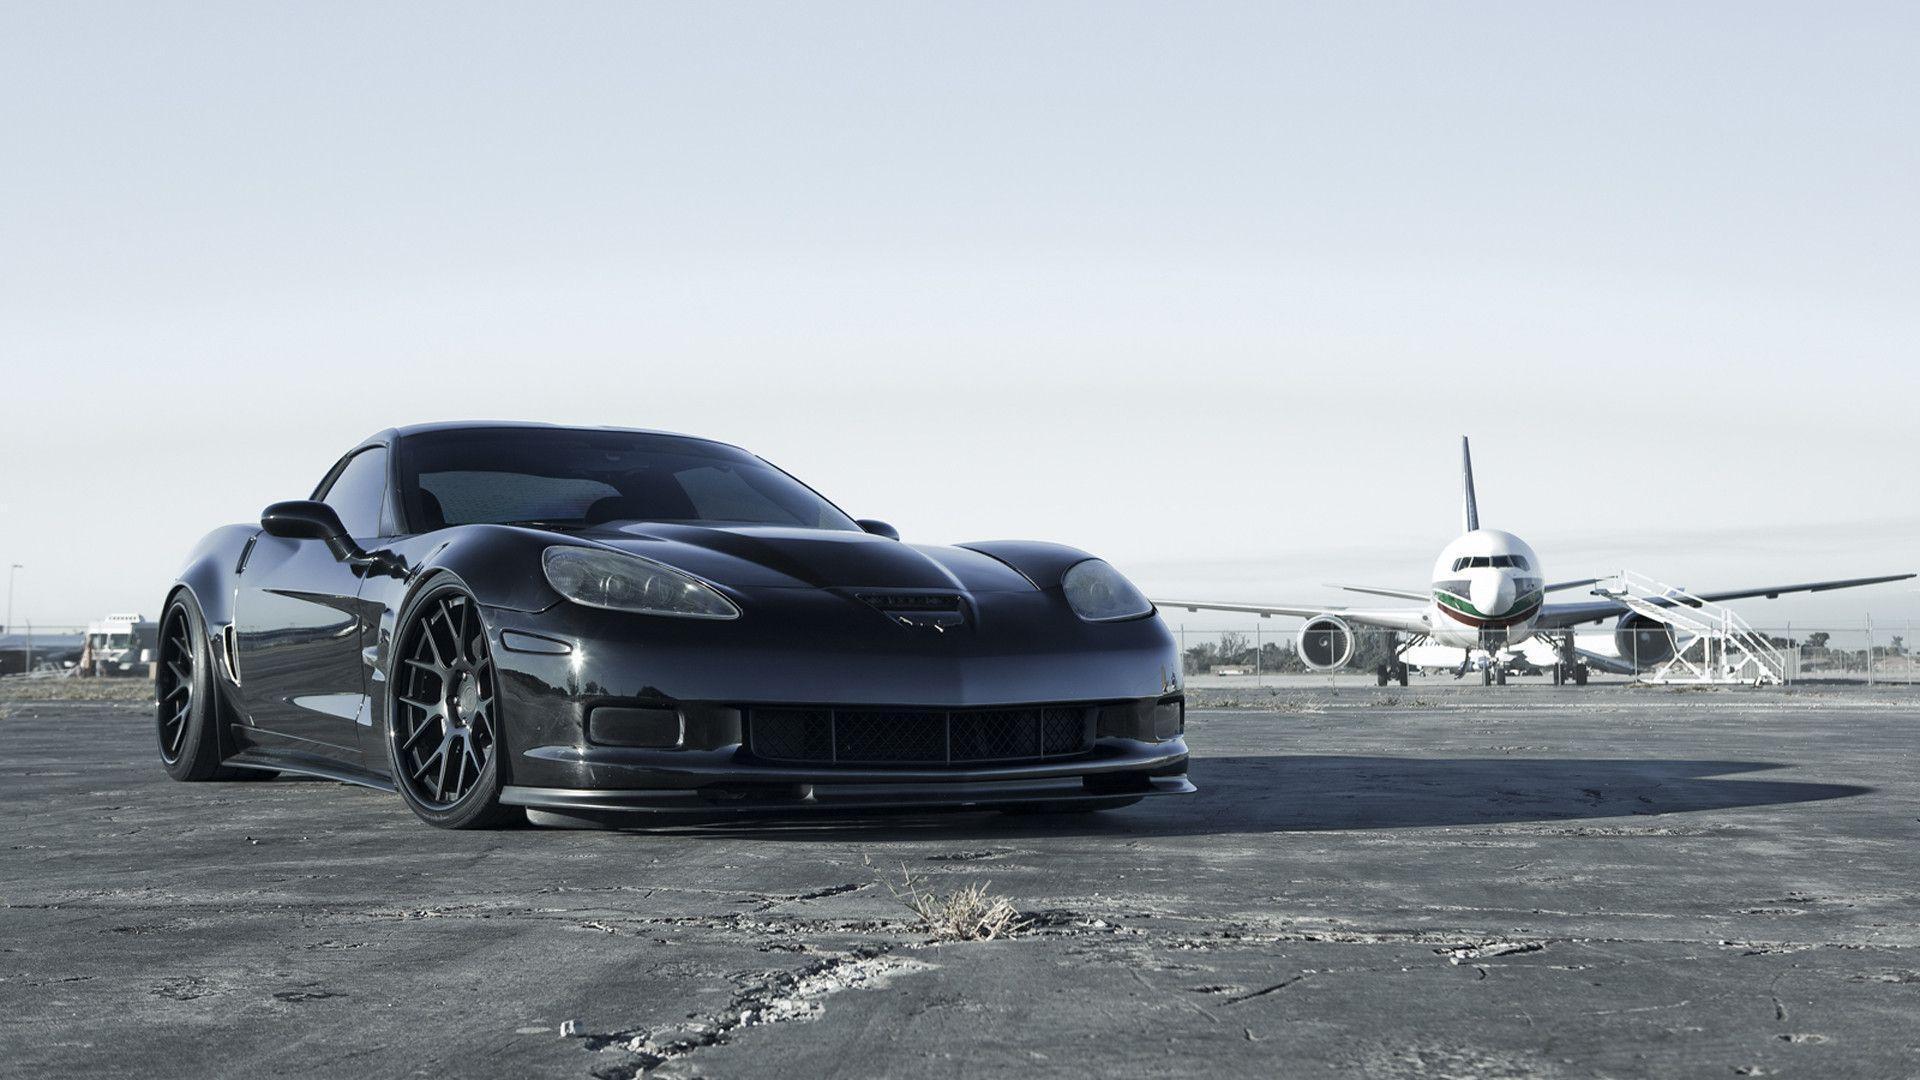 black corvette zr1 wallpapers - photo #3